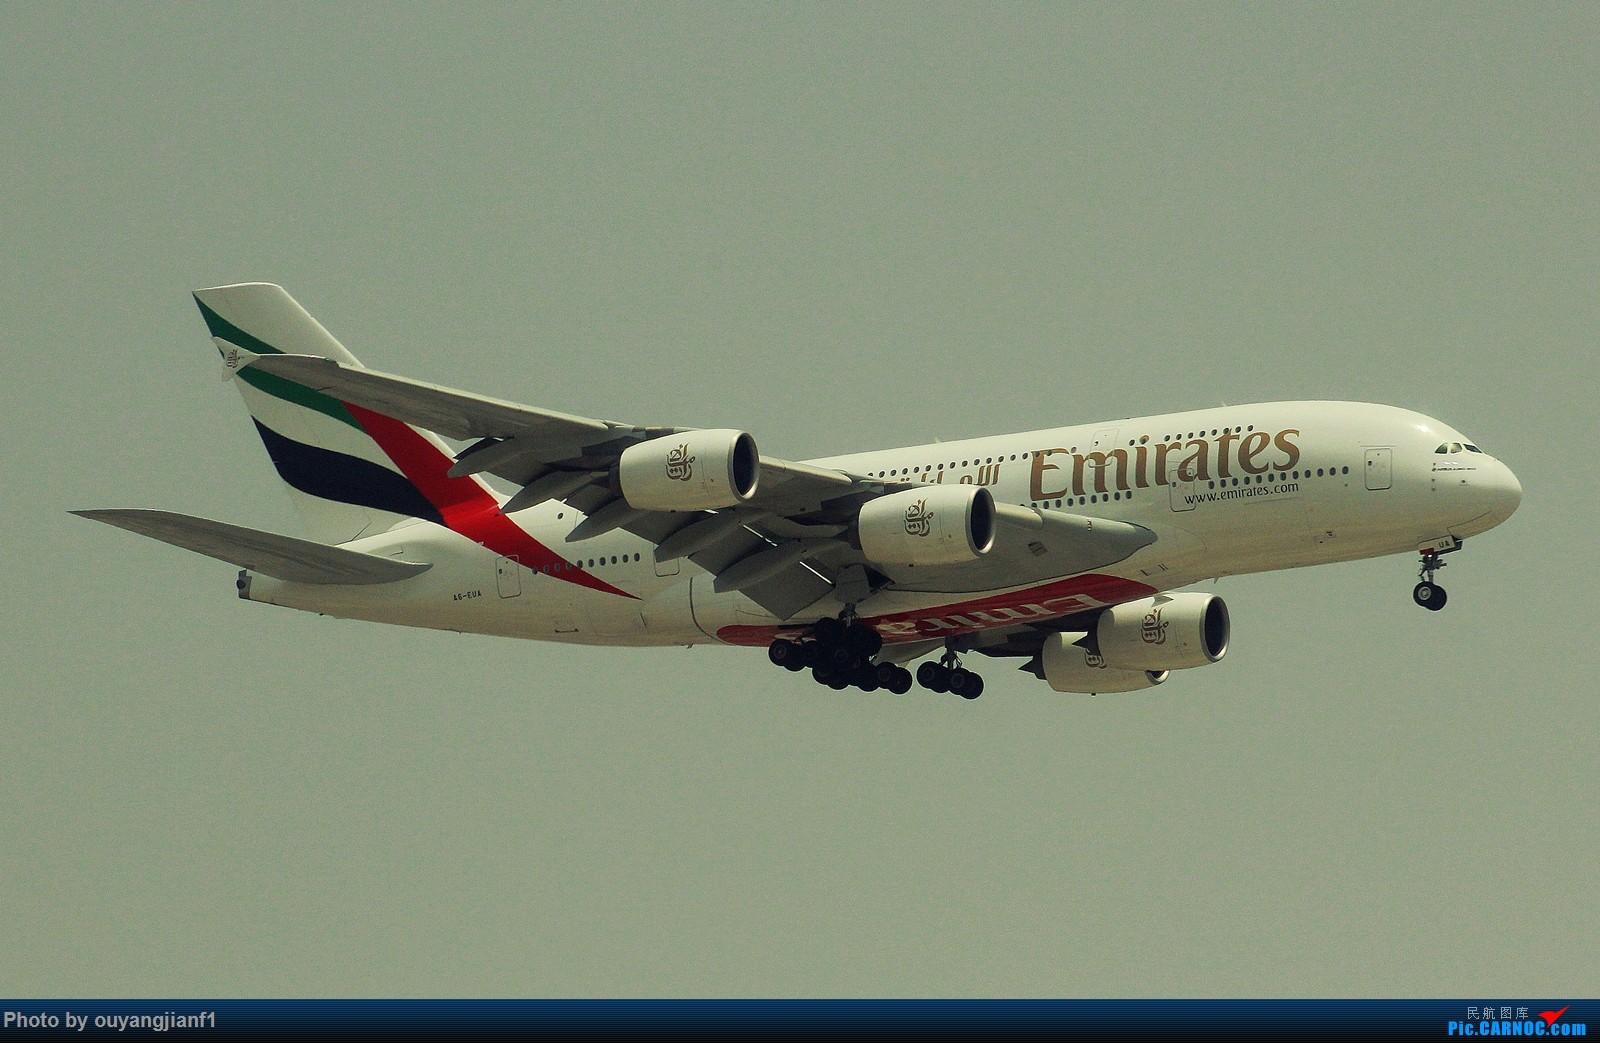 Re:[原创]很多年没有来贴图区了,记一次本不在计划中的迪拜拍机之行,在漫天黄沙中EK的380和777真的看到吐血.... AIRBUS A380-800 A6-EUA 阿拉伯联合酋长国迪拜国际机场